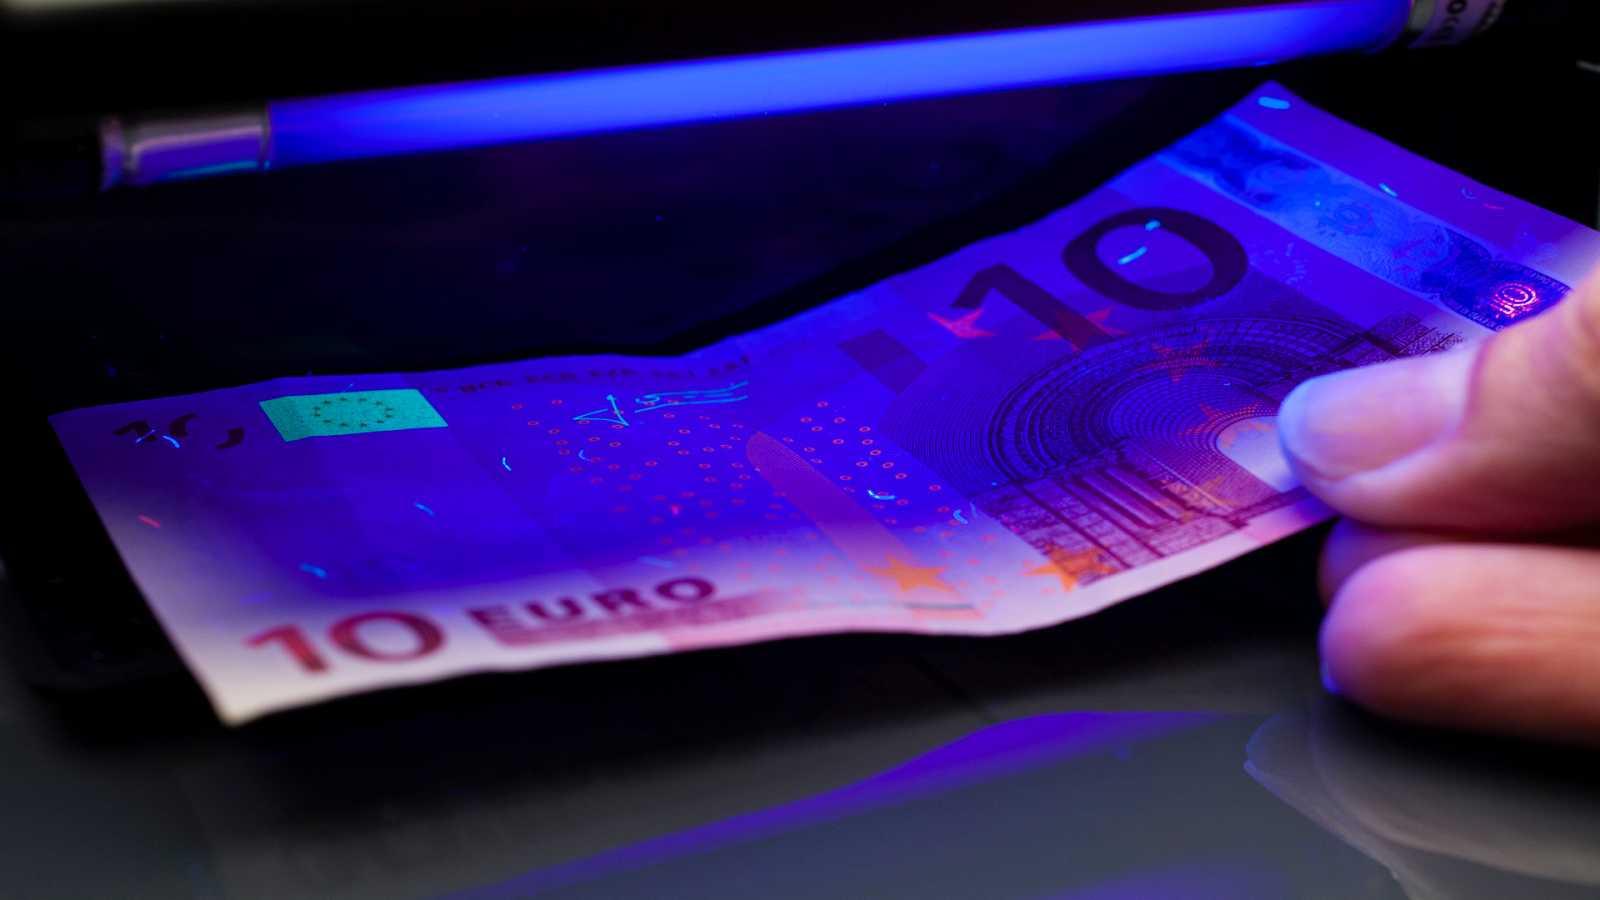 Canal Europa - Aumentan falsificaciones en Europa - 02/03/21 - Escuchar ahora